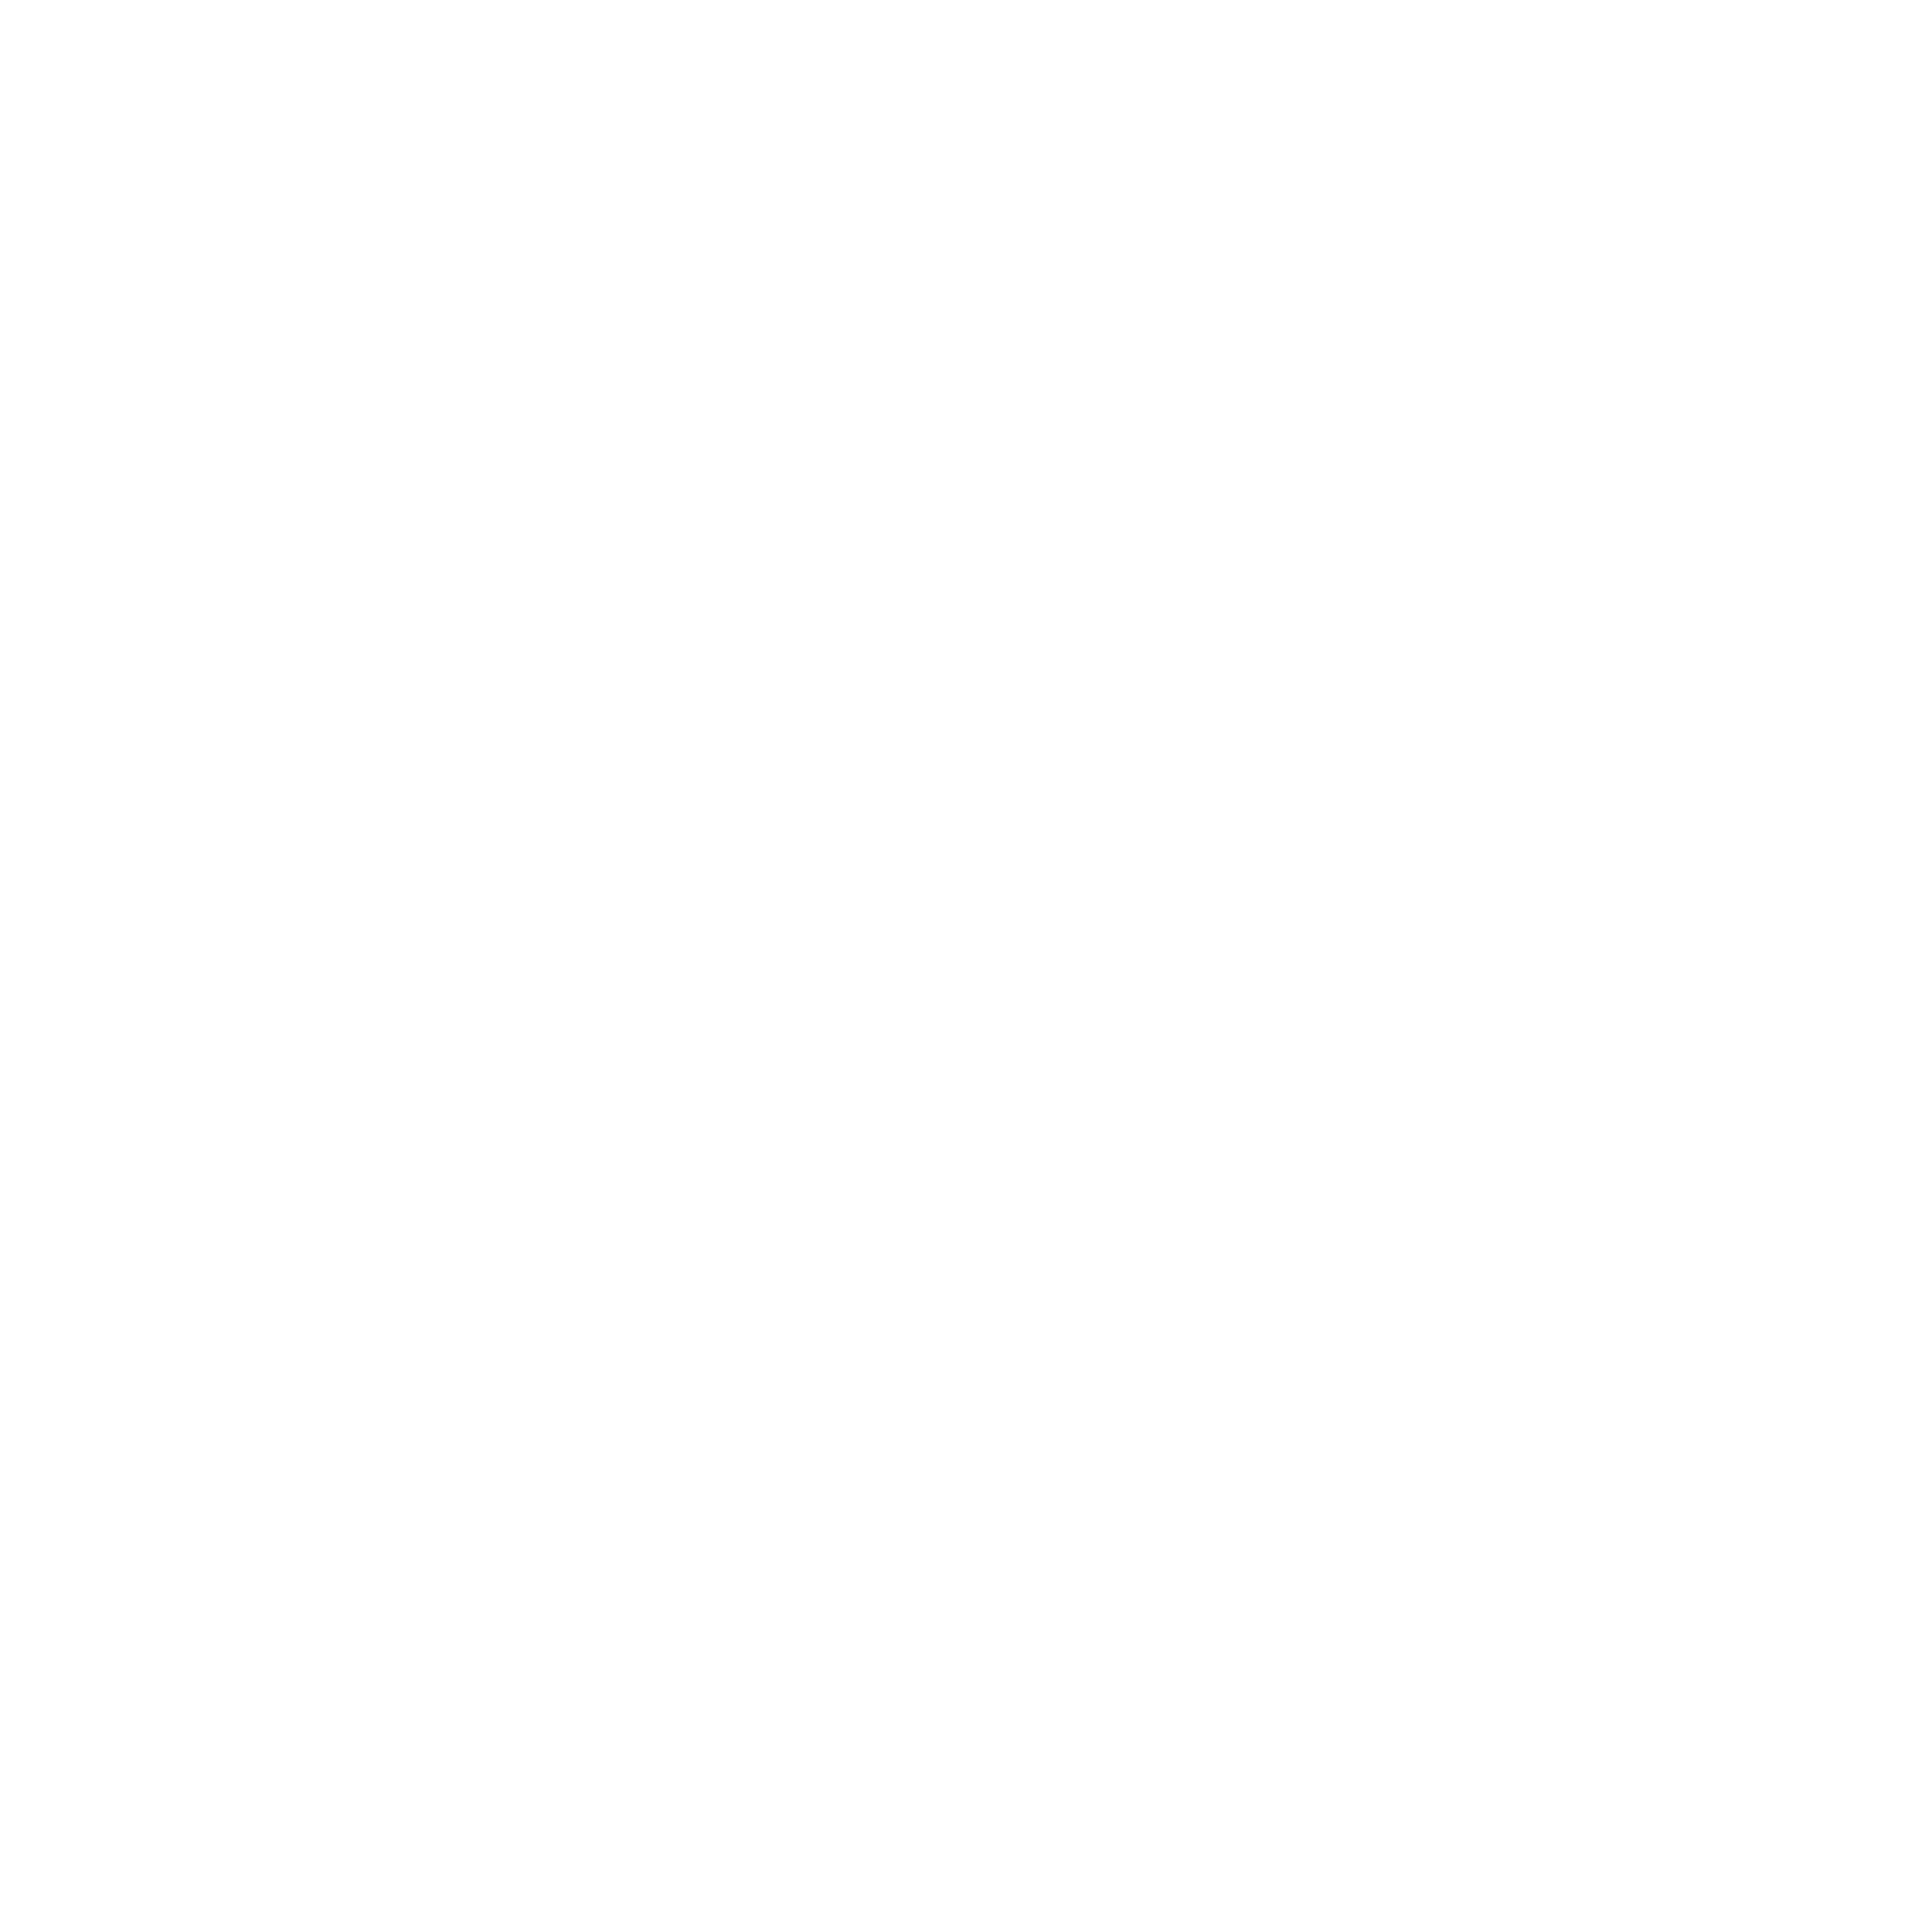 transports de luxe-01-01-01-01